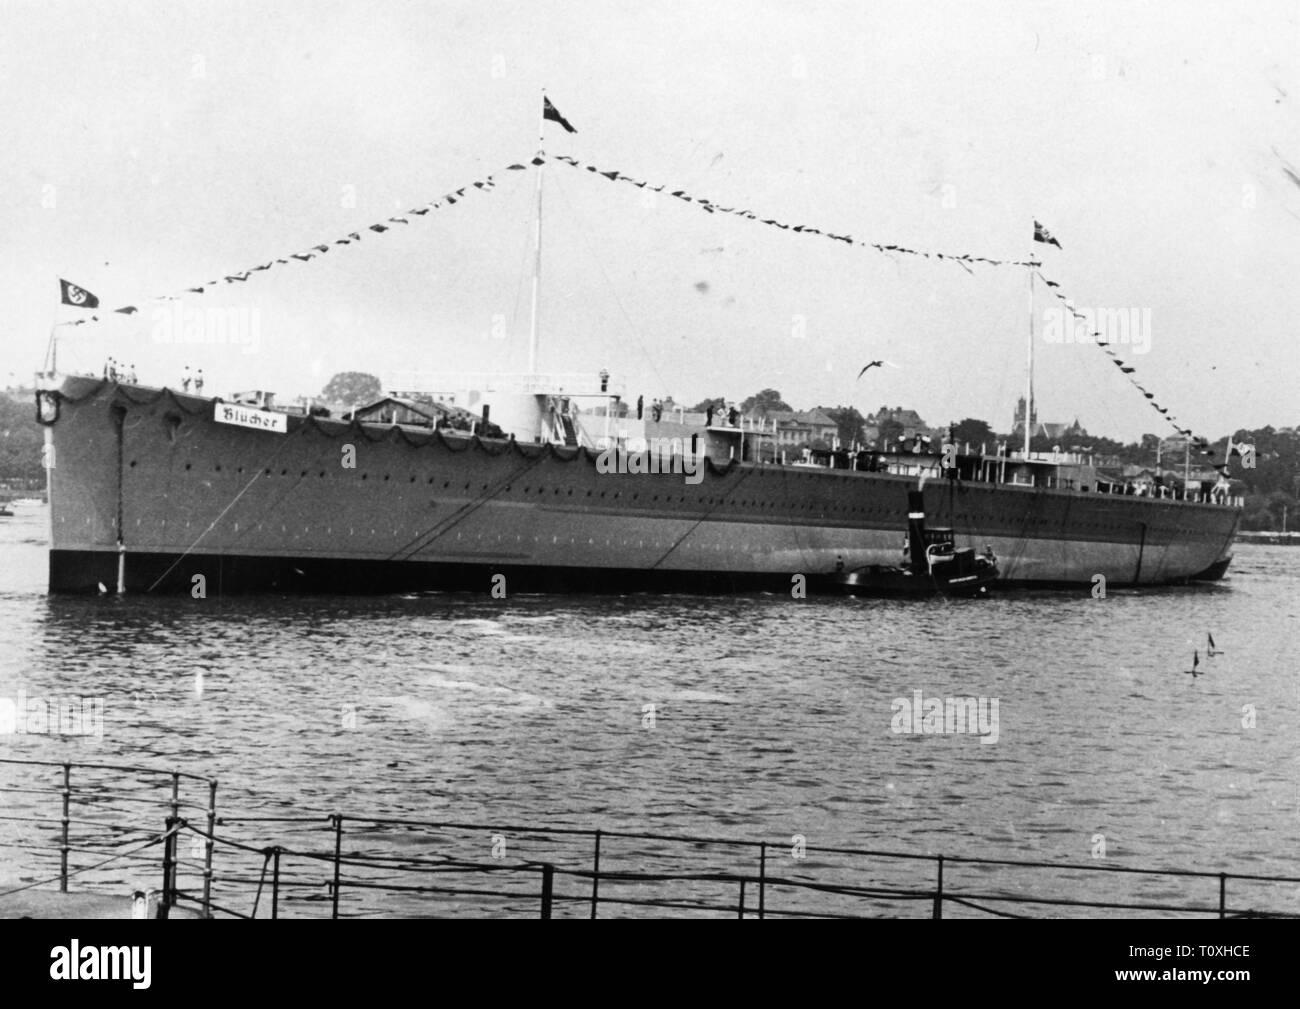 Transporte / Transporte, Navegación, buques de guerra, GER, HEAVY CRUISER 'Bluecher', construida en Deutsche Werke de Kiel, lanzamiento, 8.6.1937-Clearance-Info Additional-Rights-Not-Available Foto de stock